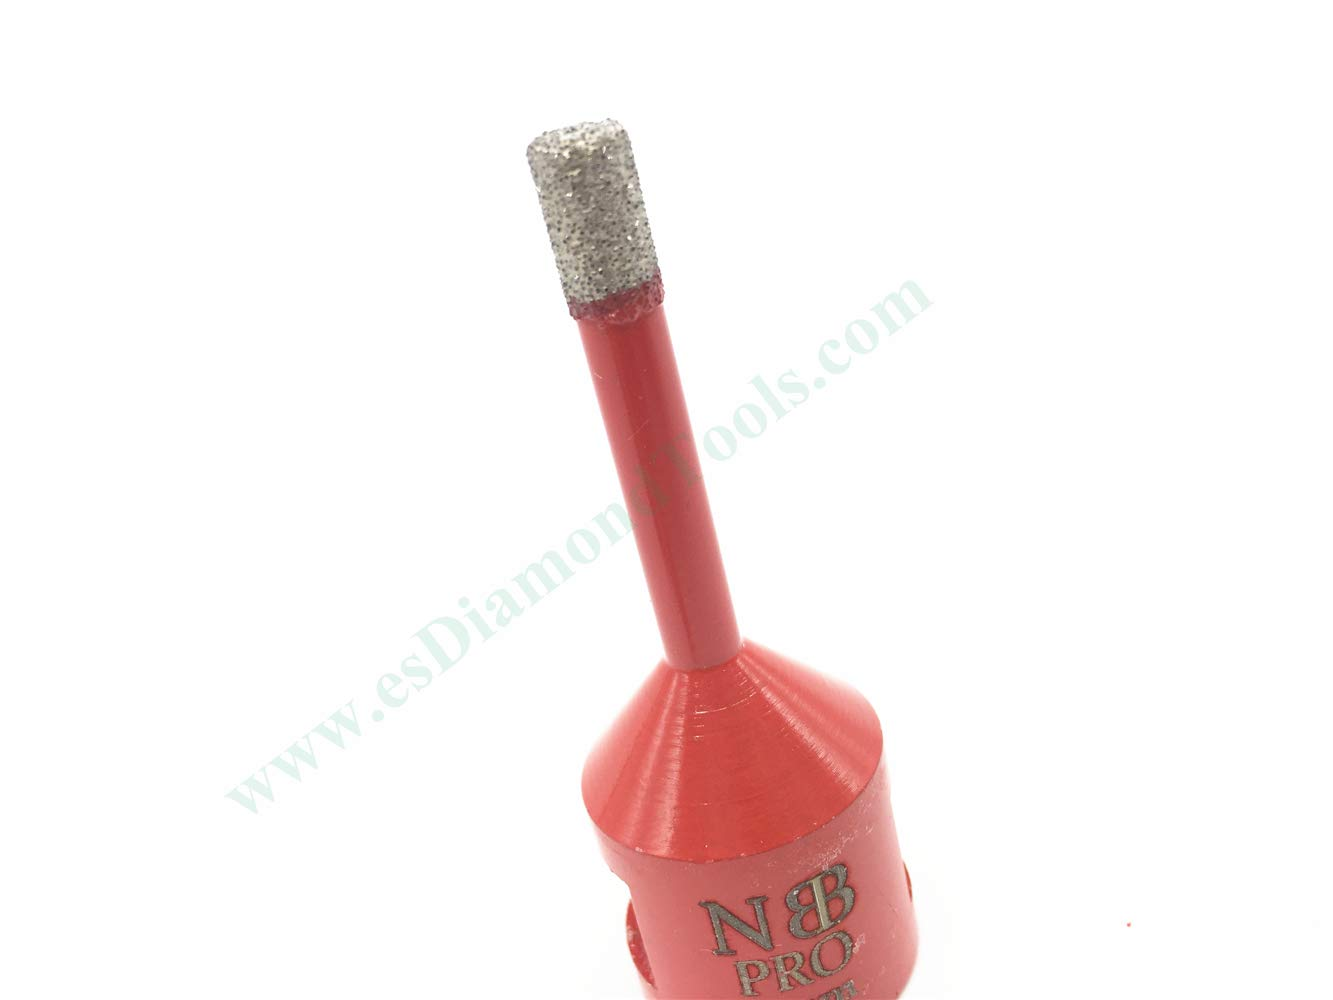 perforaci/ón en seco en porcelana no necesita agua Dia.6mm m/ármol granito Para amoladora angular M14 EASTAR brocas de diamante en seco para amoladora angular azulejos cer/ámica